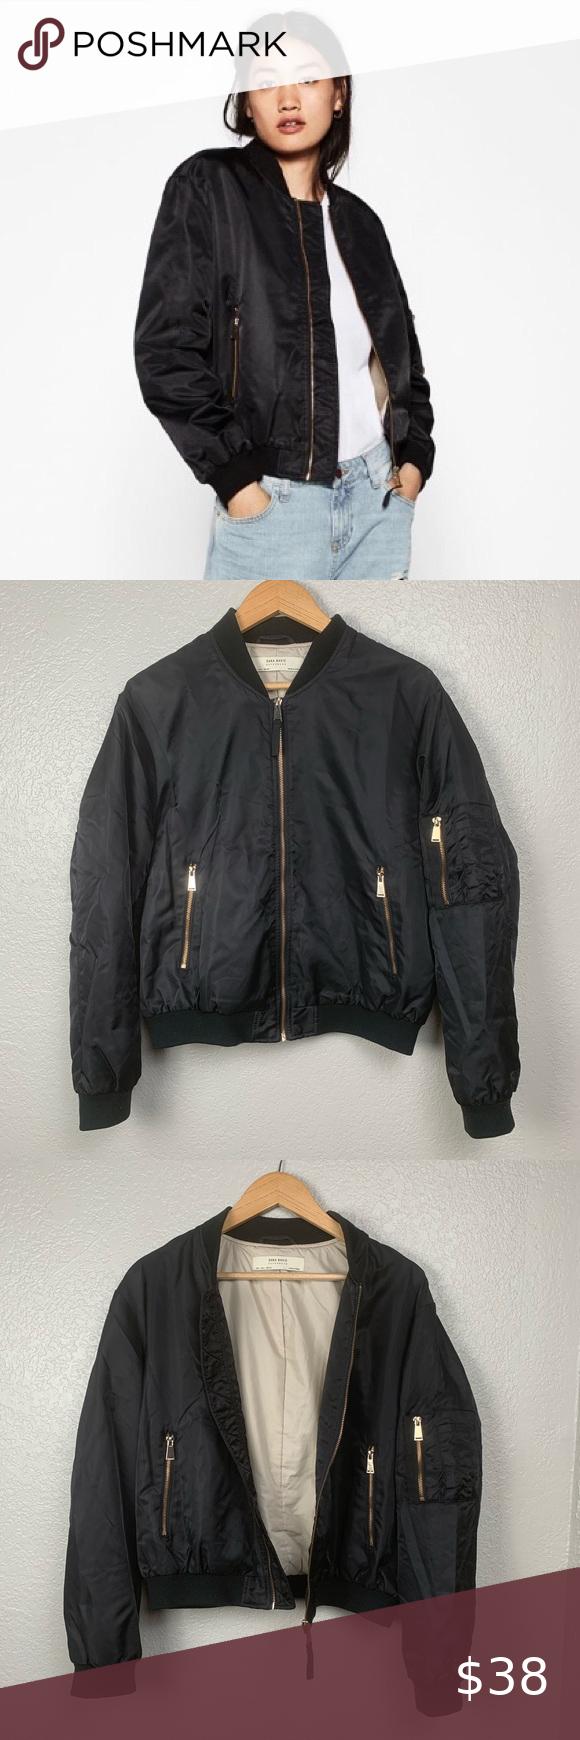 Hp Zara Basic Outerwear Black Bomber Jacket Black Bomber Jacket Fashion Zara Basic [ 1740 x 580 Pixel ]